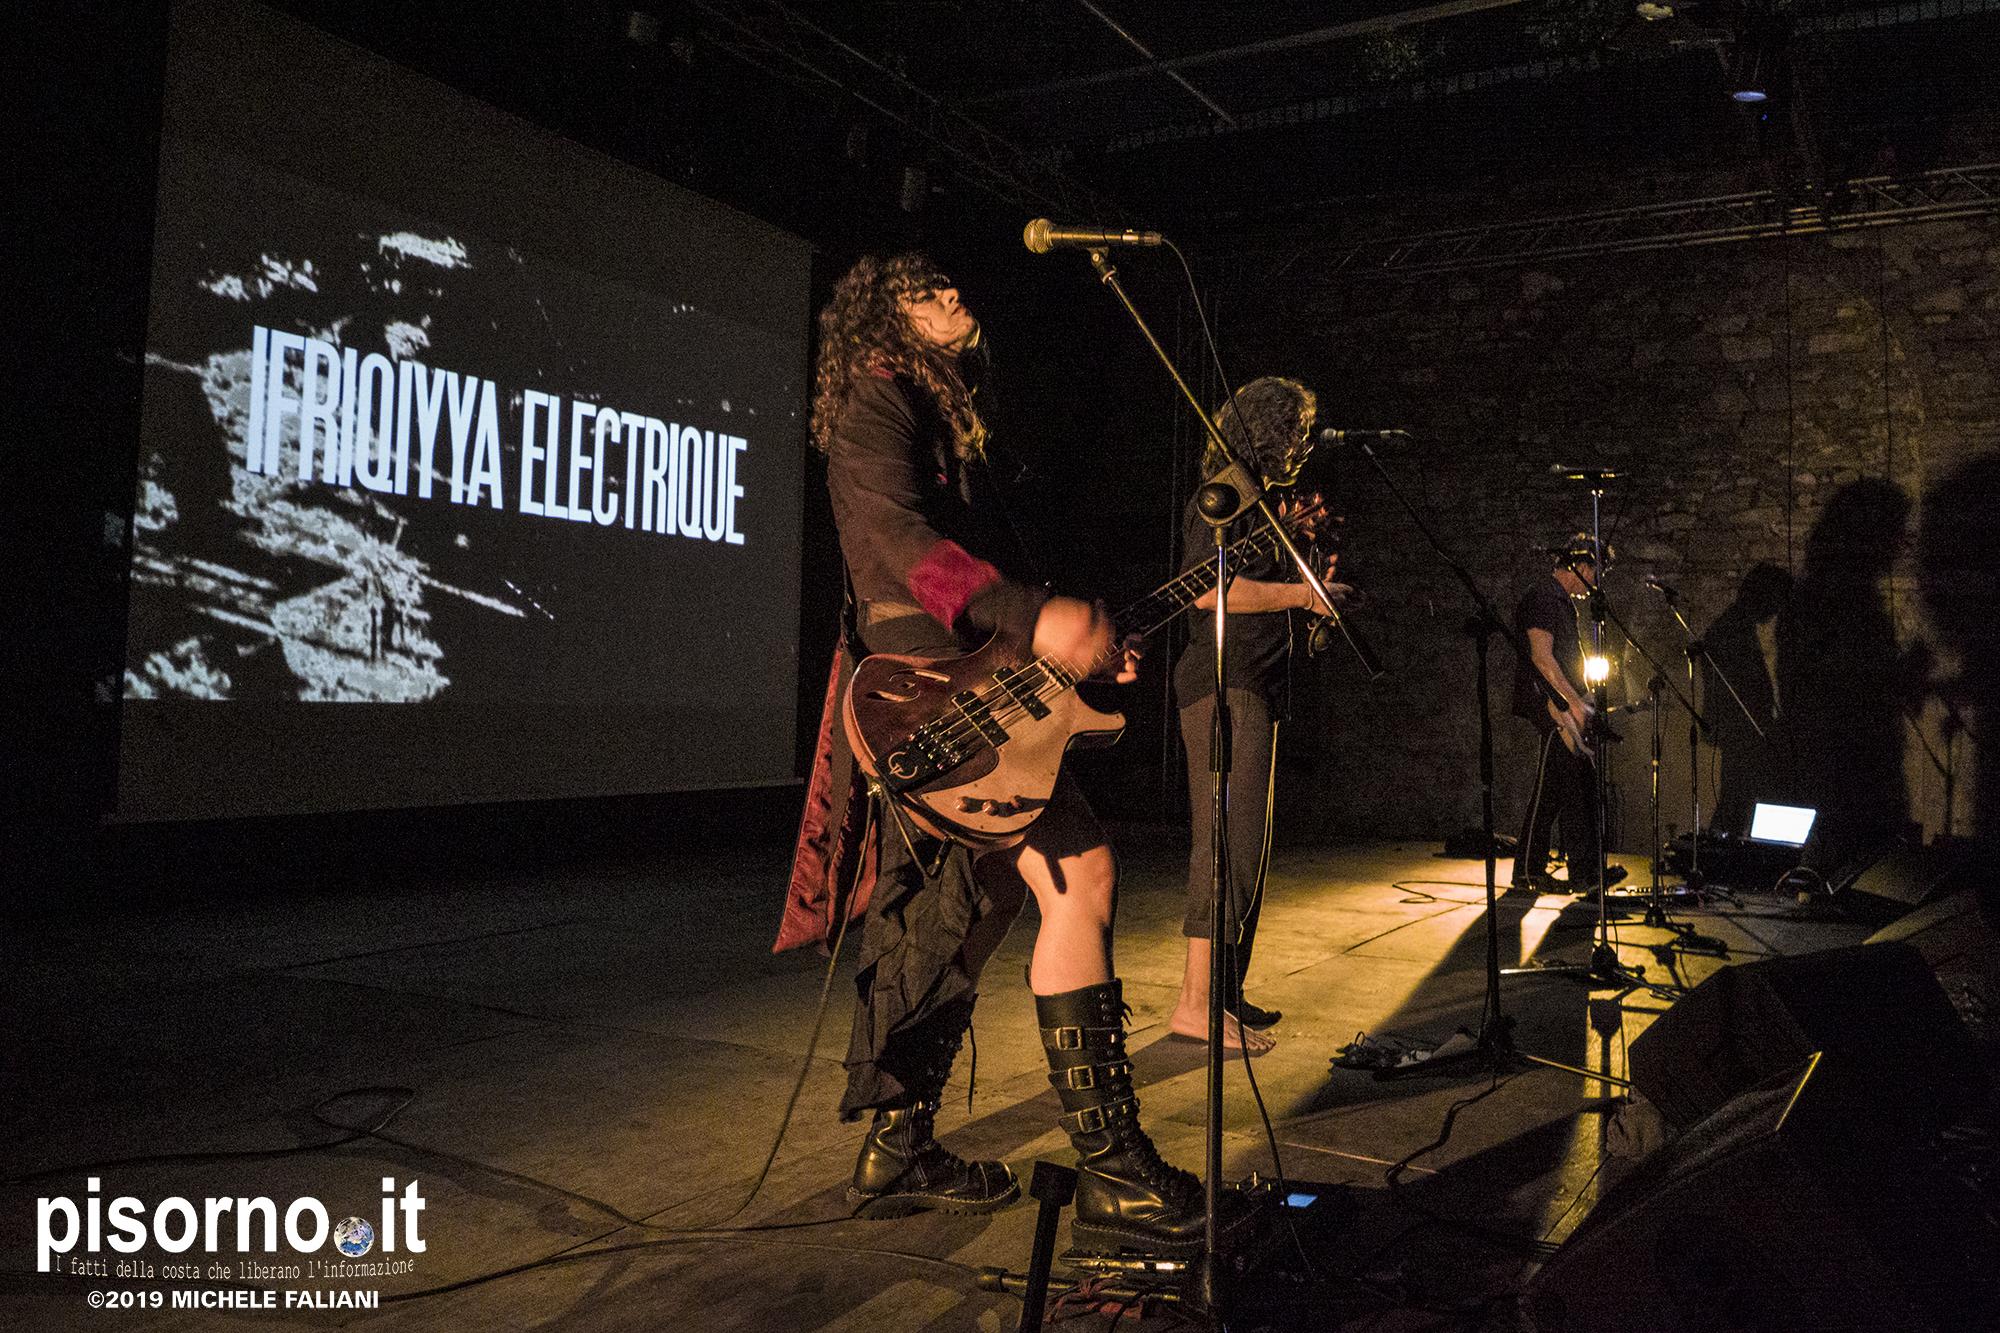 Ifriqiyya Électrique live @ San Salvi (Firenze, Italy, June 28th 2019)